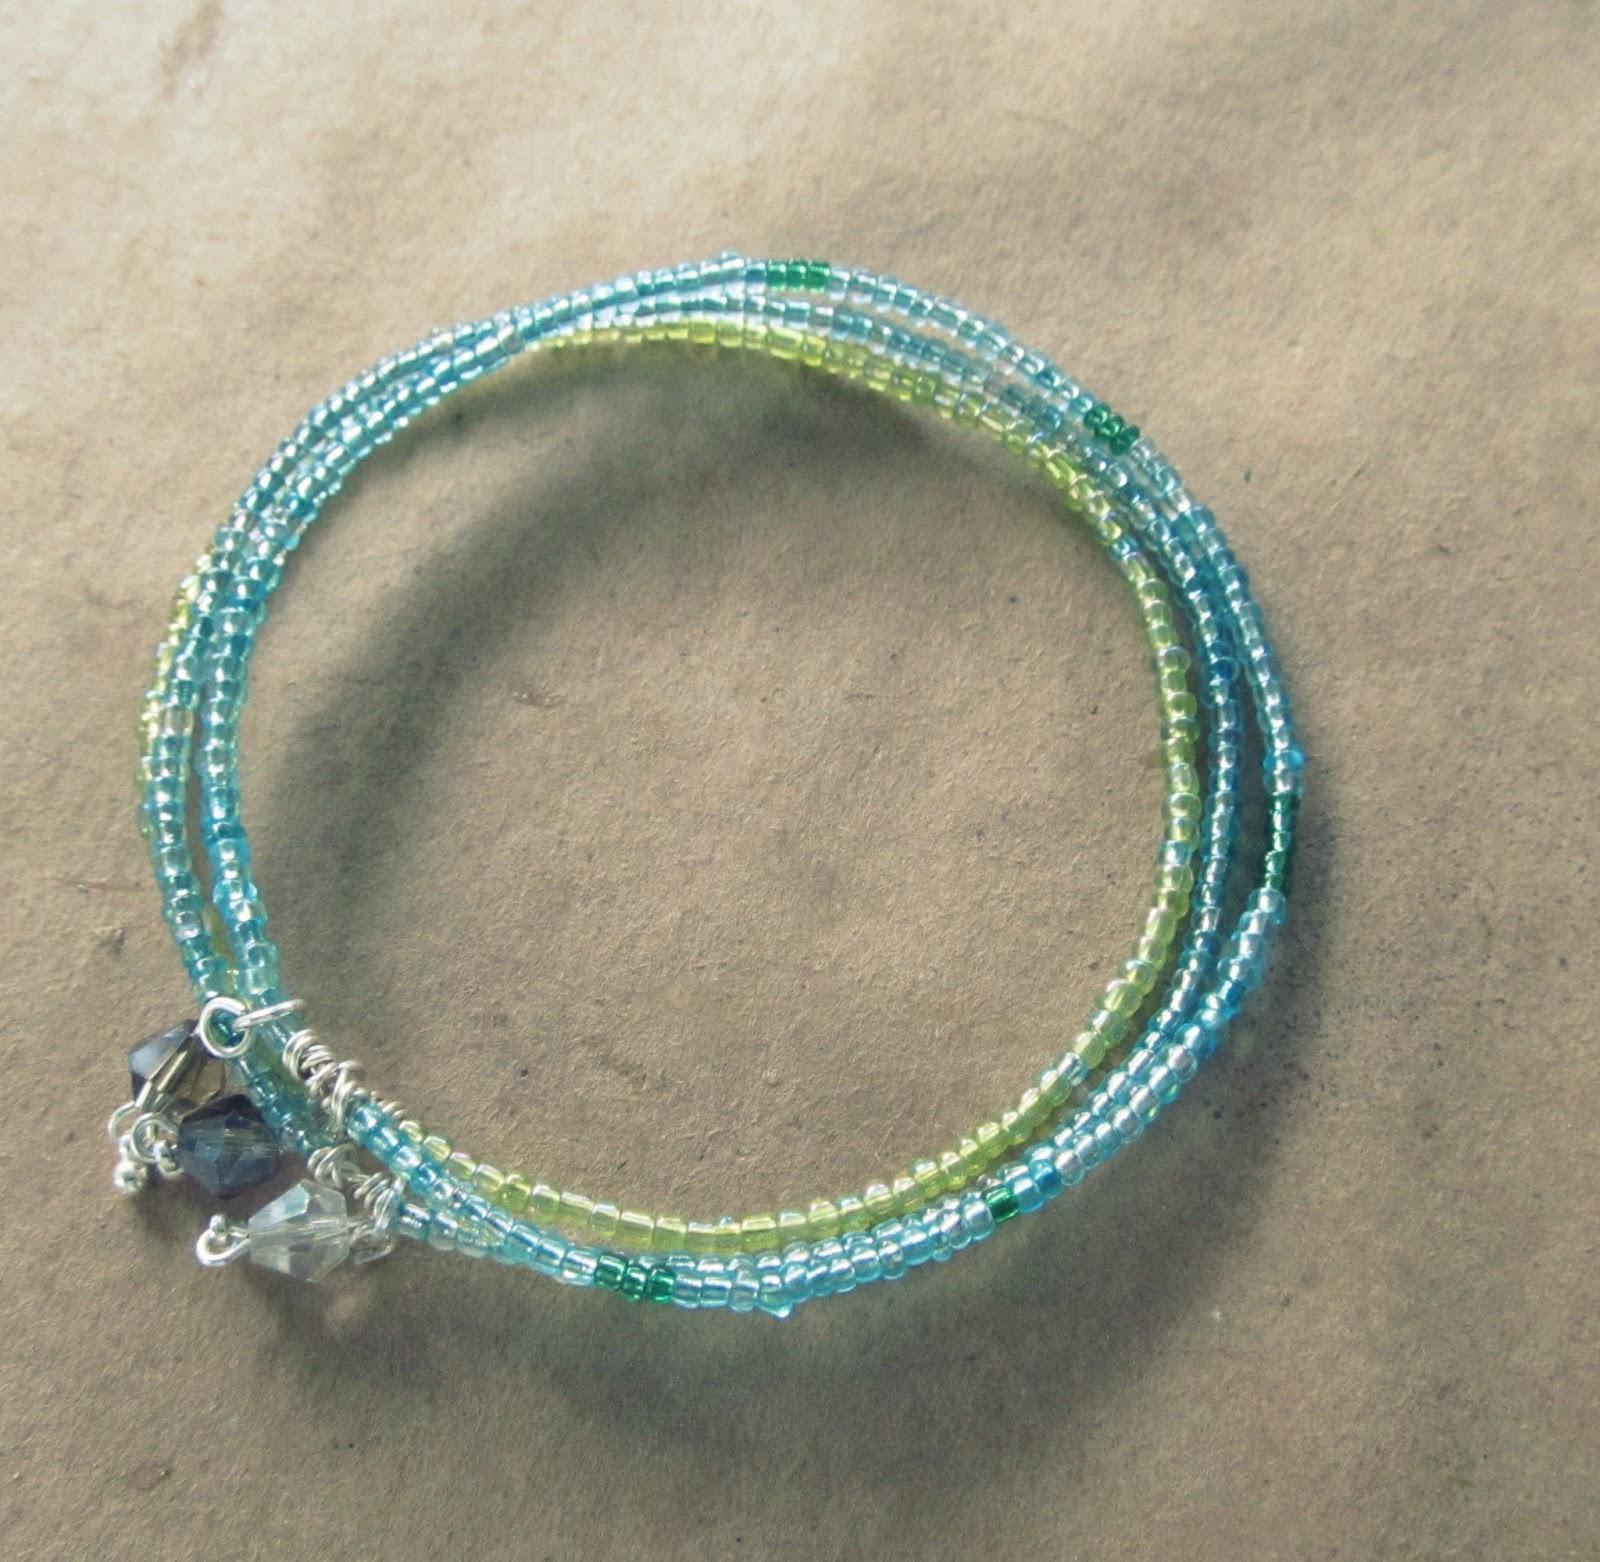 Wobisobi Seed Bead, Bangle Bracelet Diy